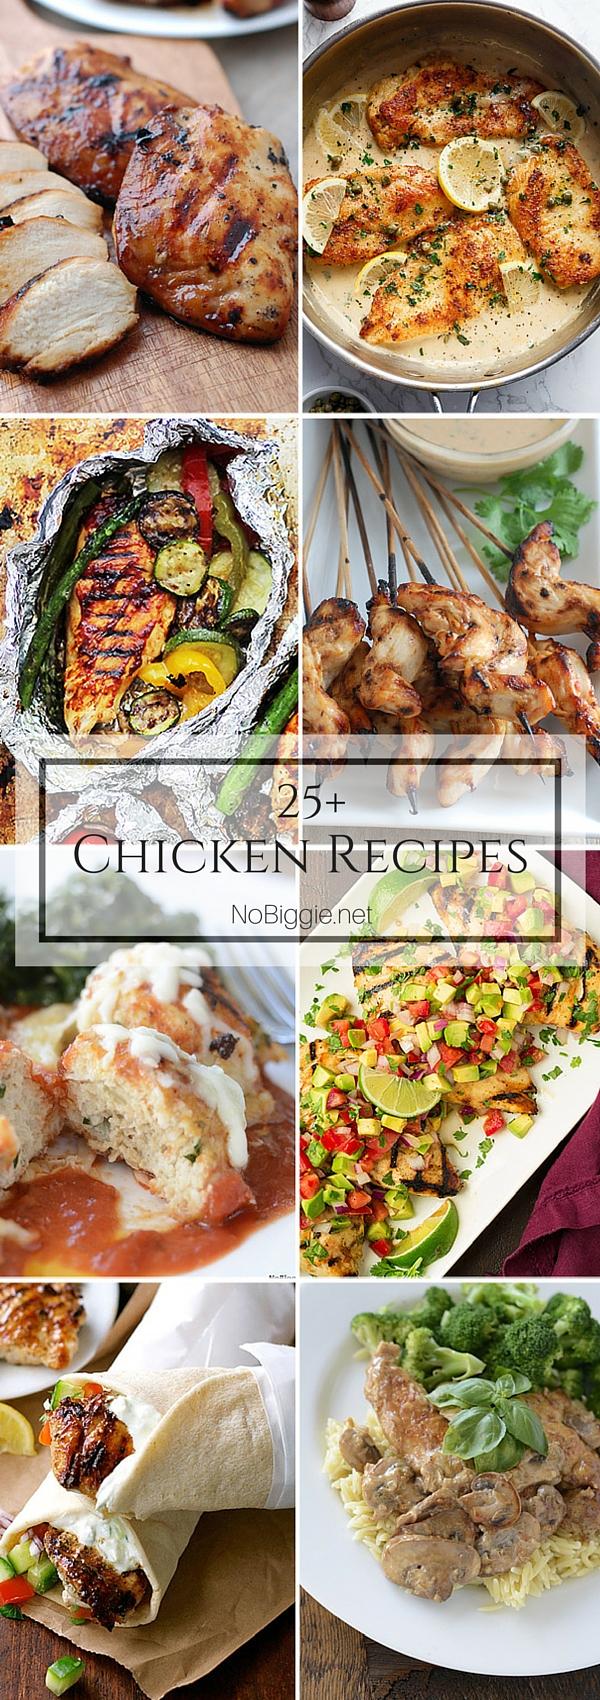 25+ Chicken Recipes   NoBiggie.net